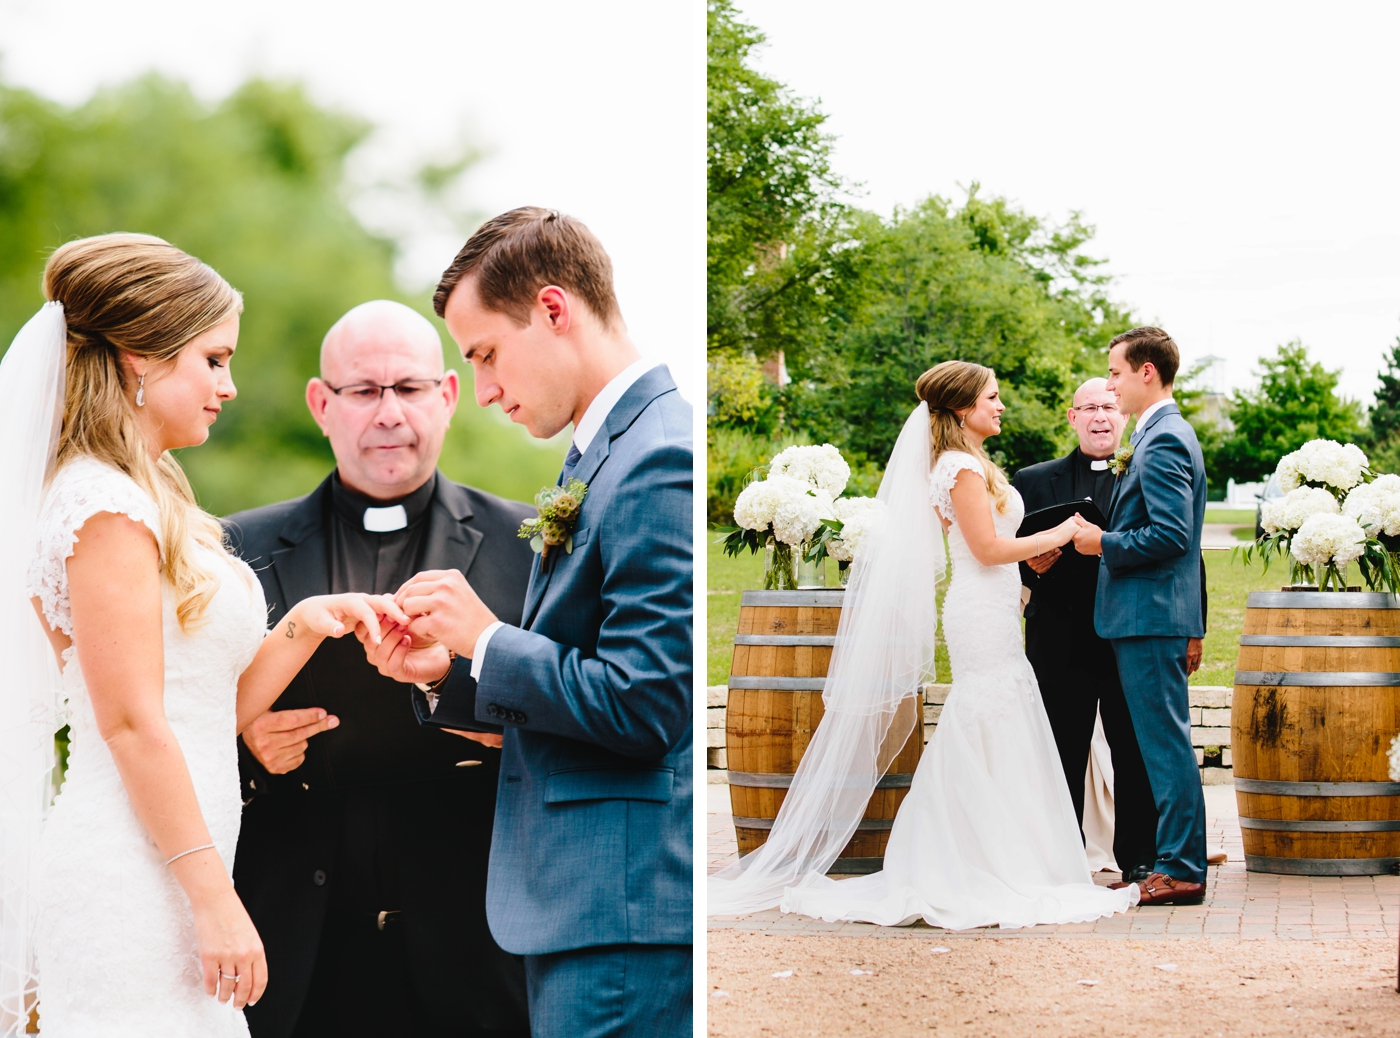 chicago-fine-art-wedding-photography-chiapetta29